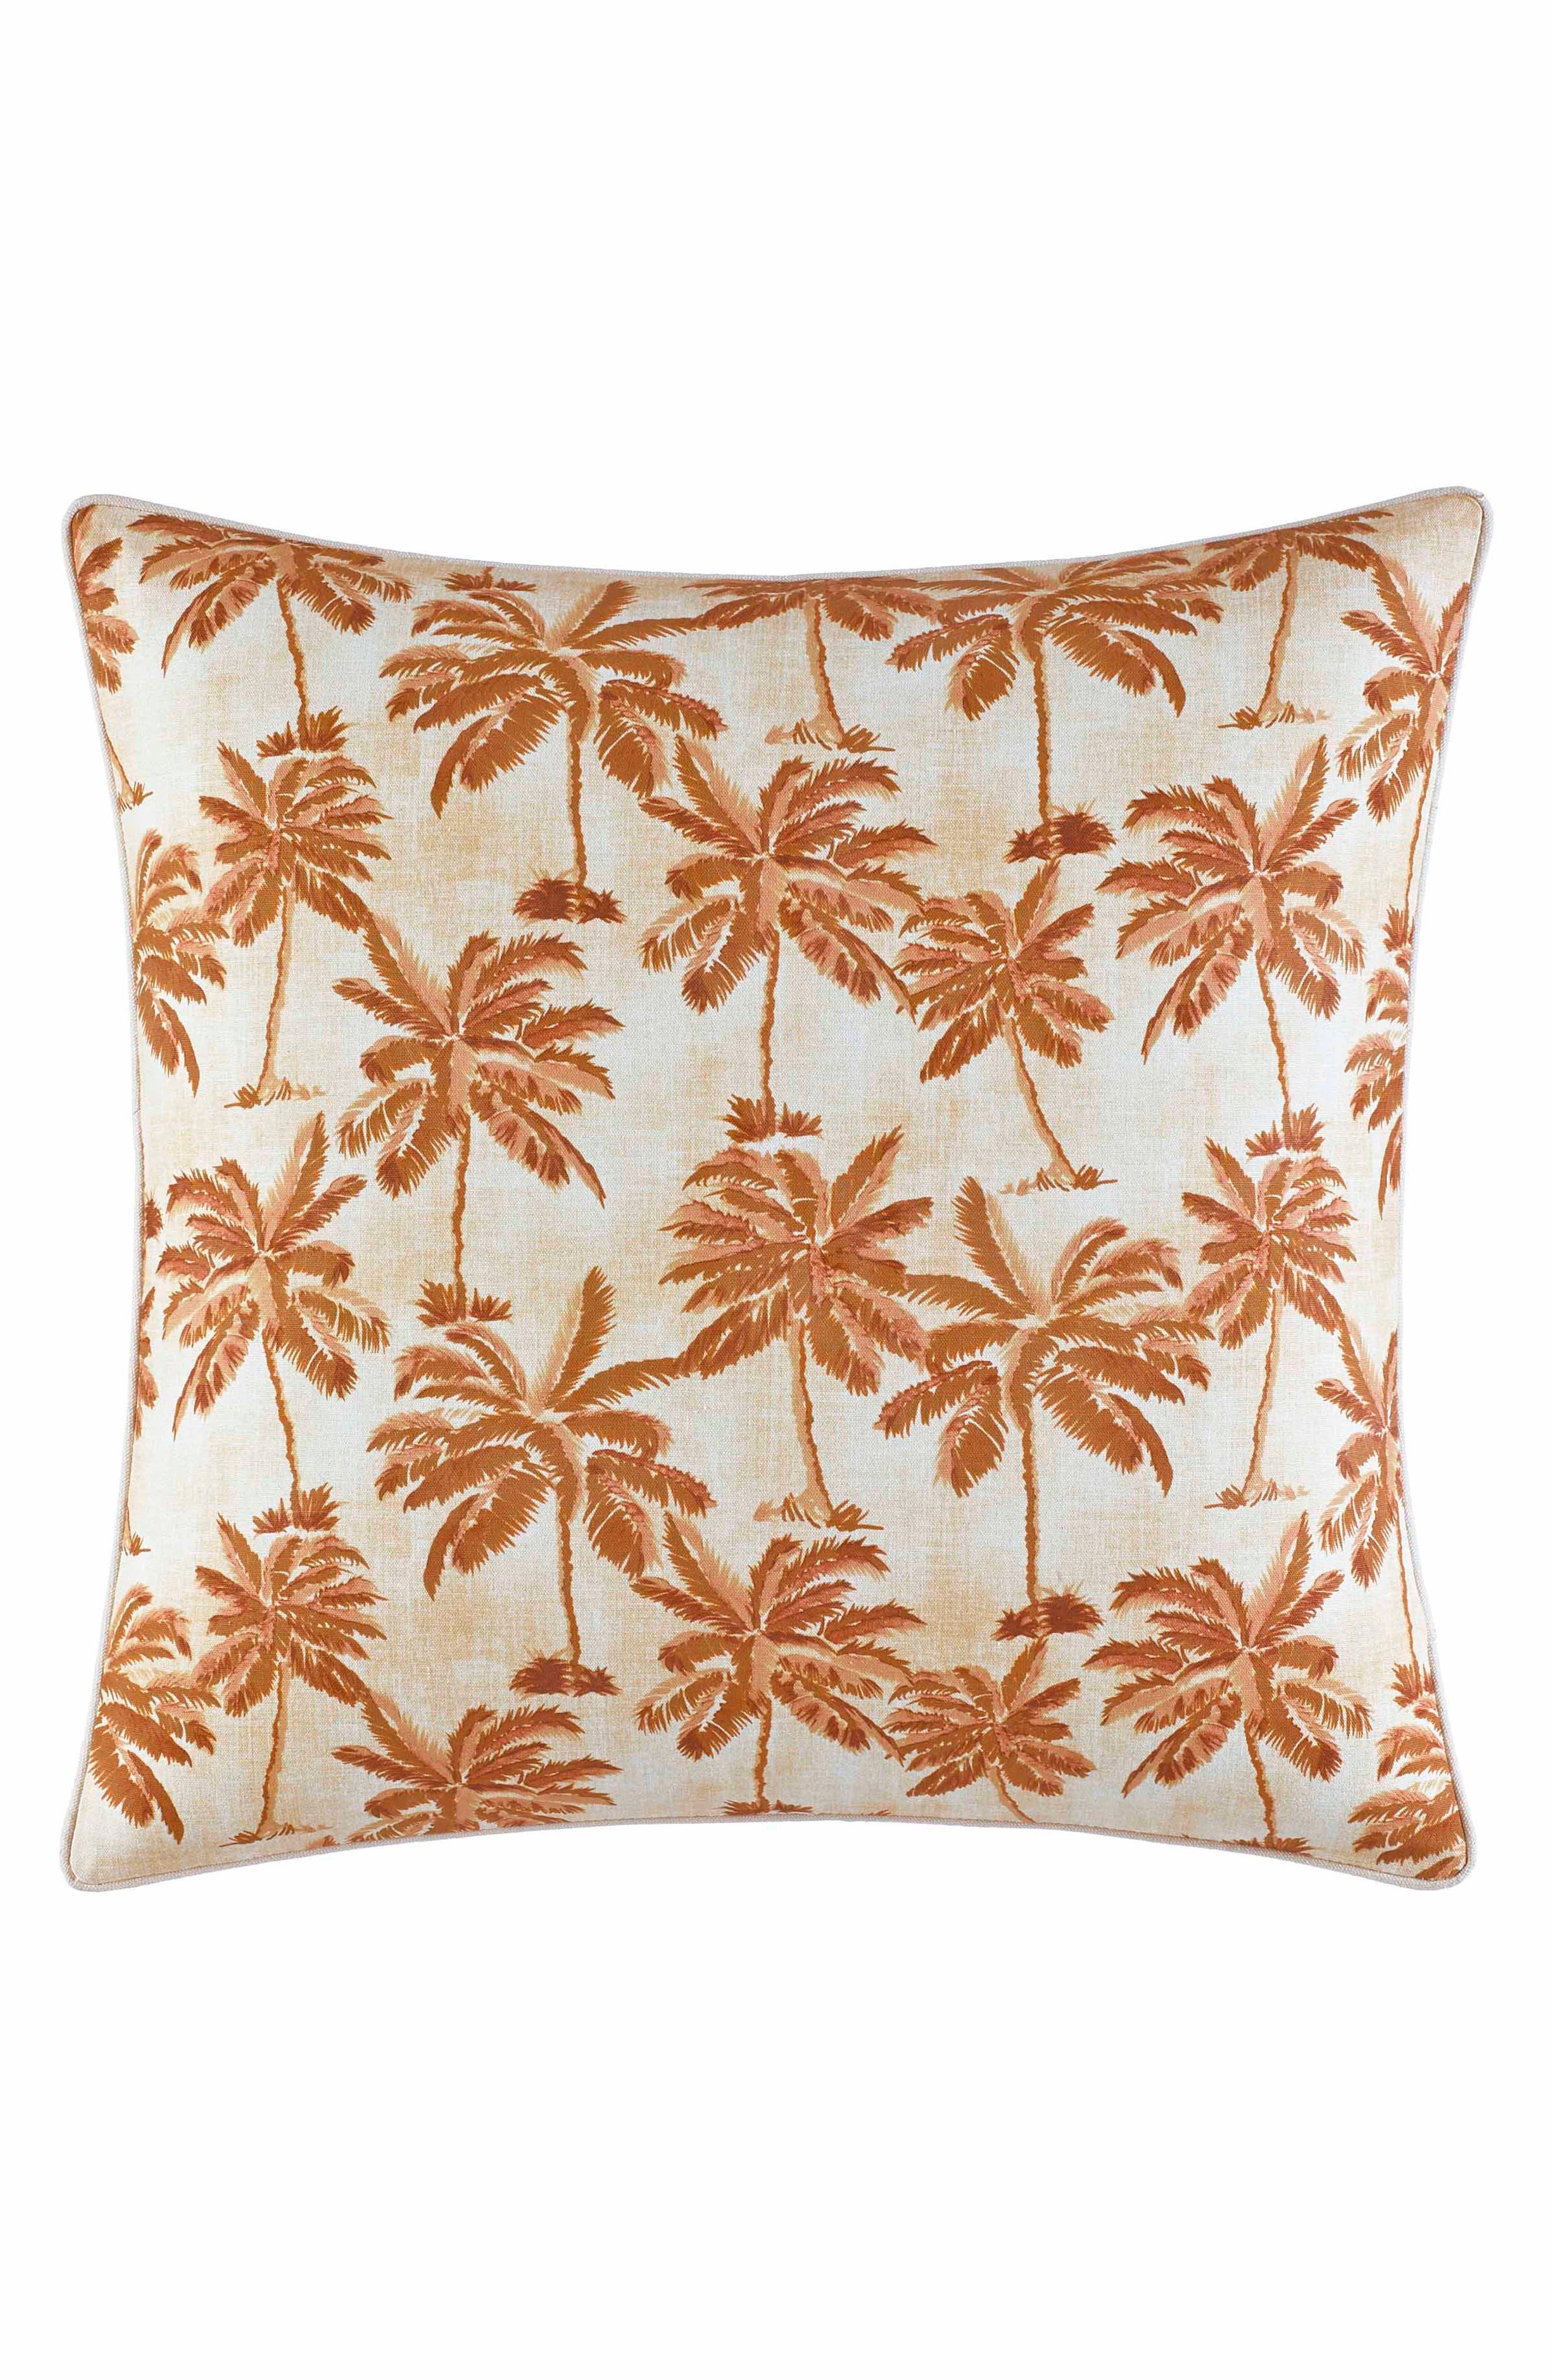 Kamari Print Accent Pillow,                         Main,                         color, Medium Orange